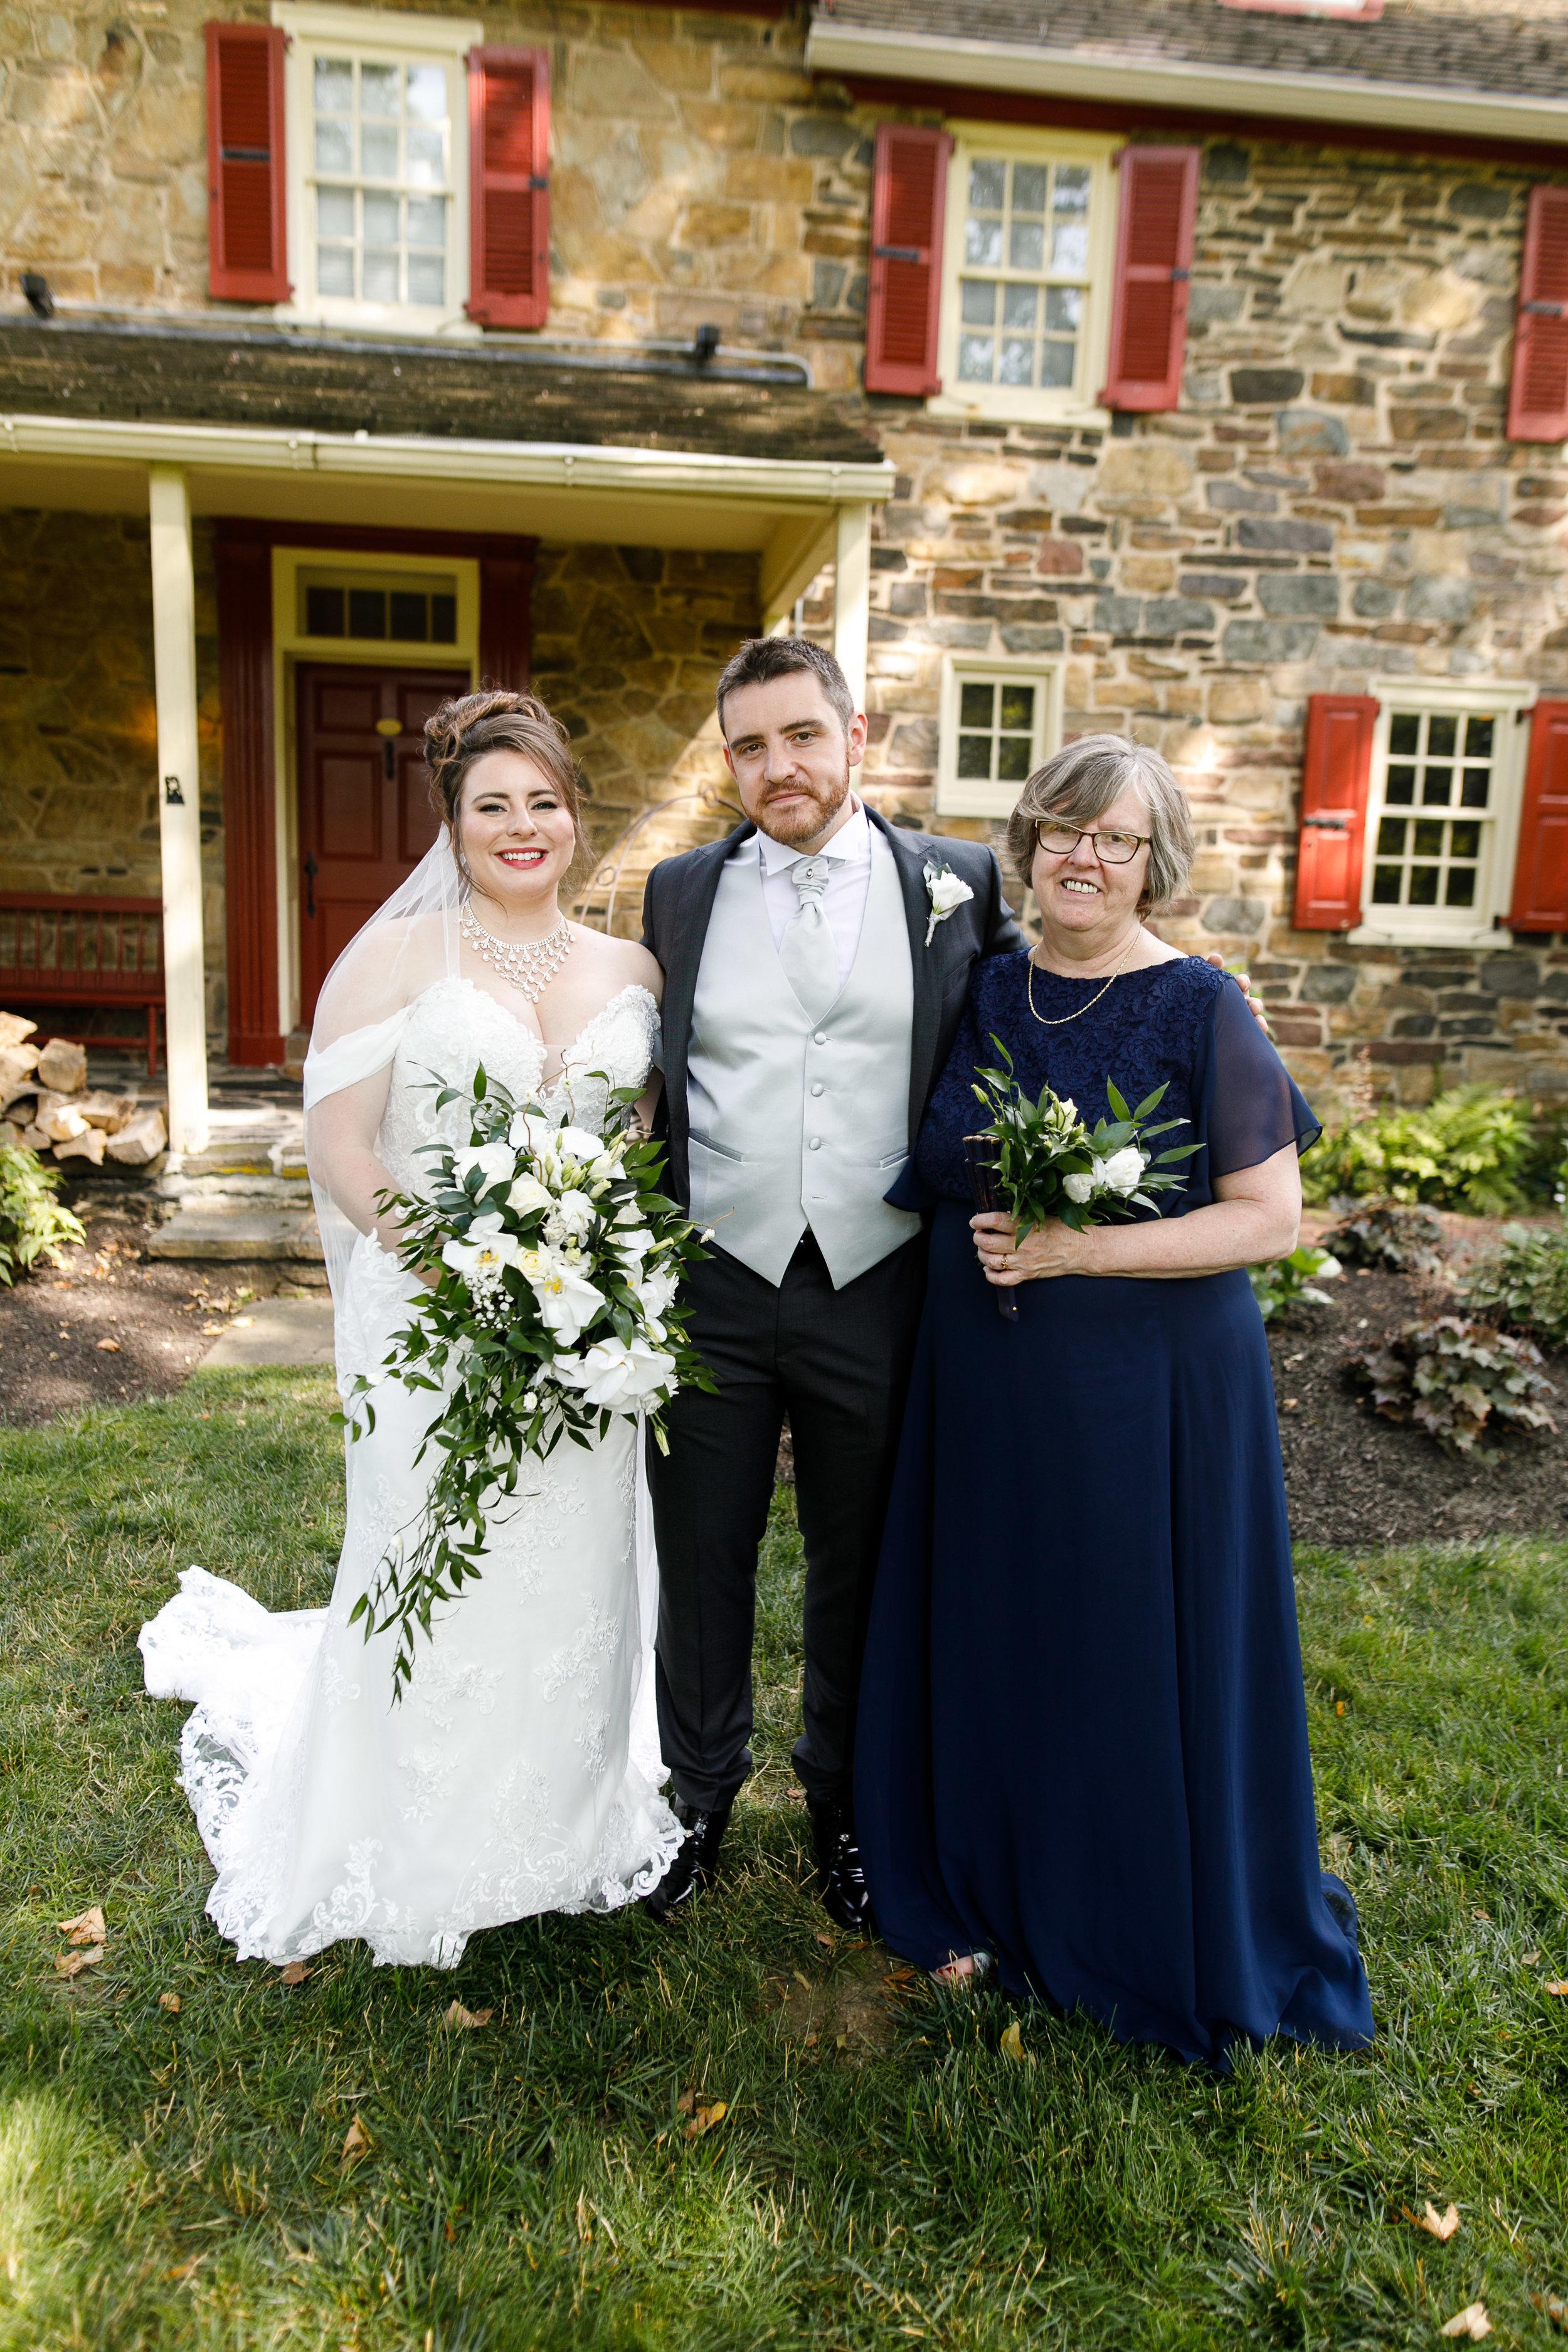 Wedding at Joseph Ambler In Bucks County PA22.jpg